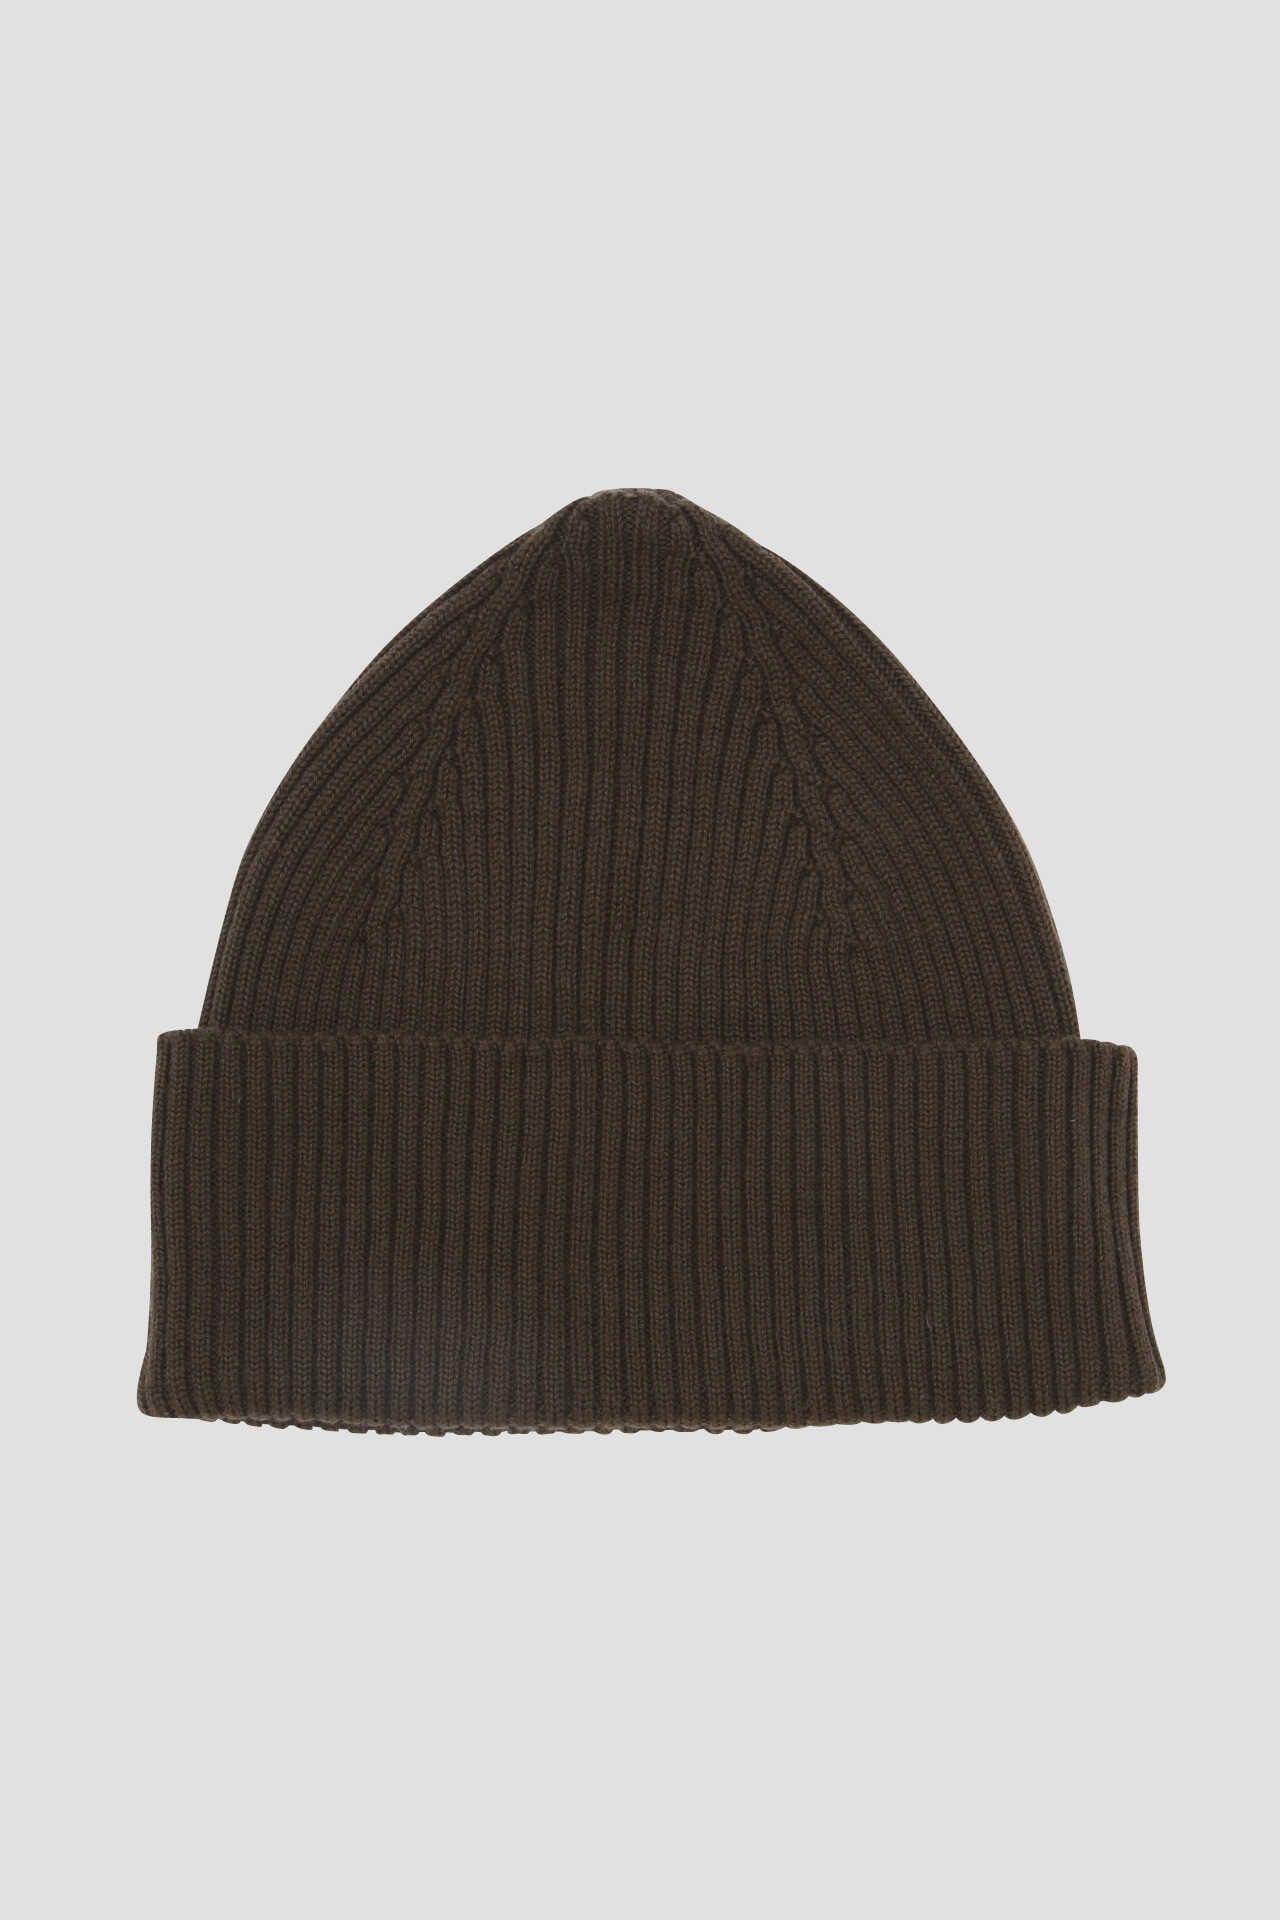 LONG RIB HAT7